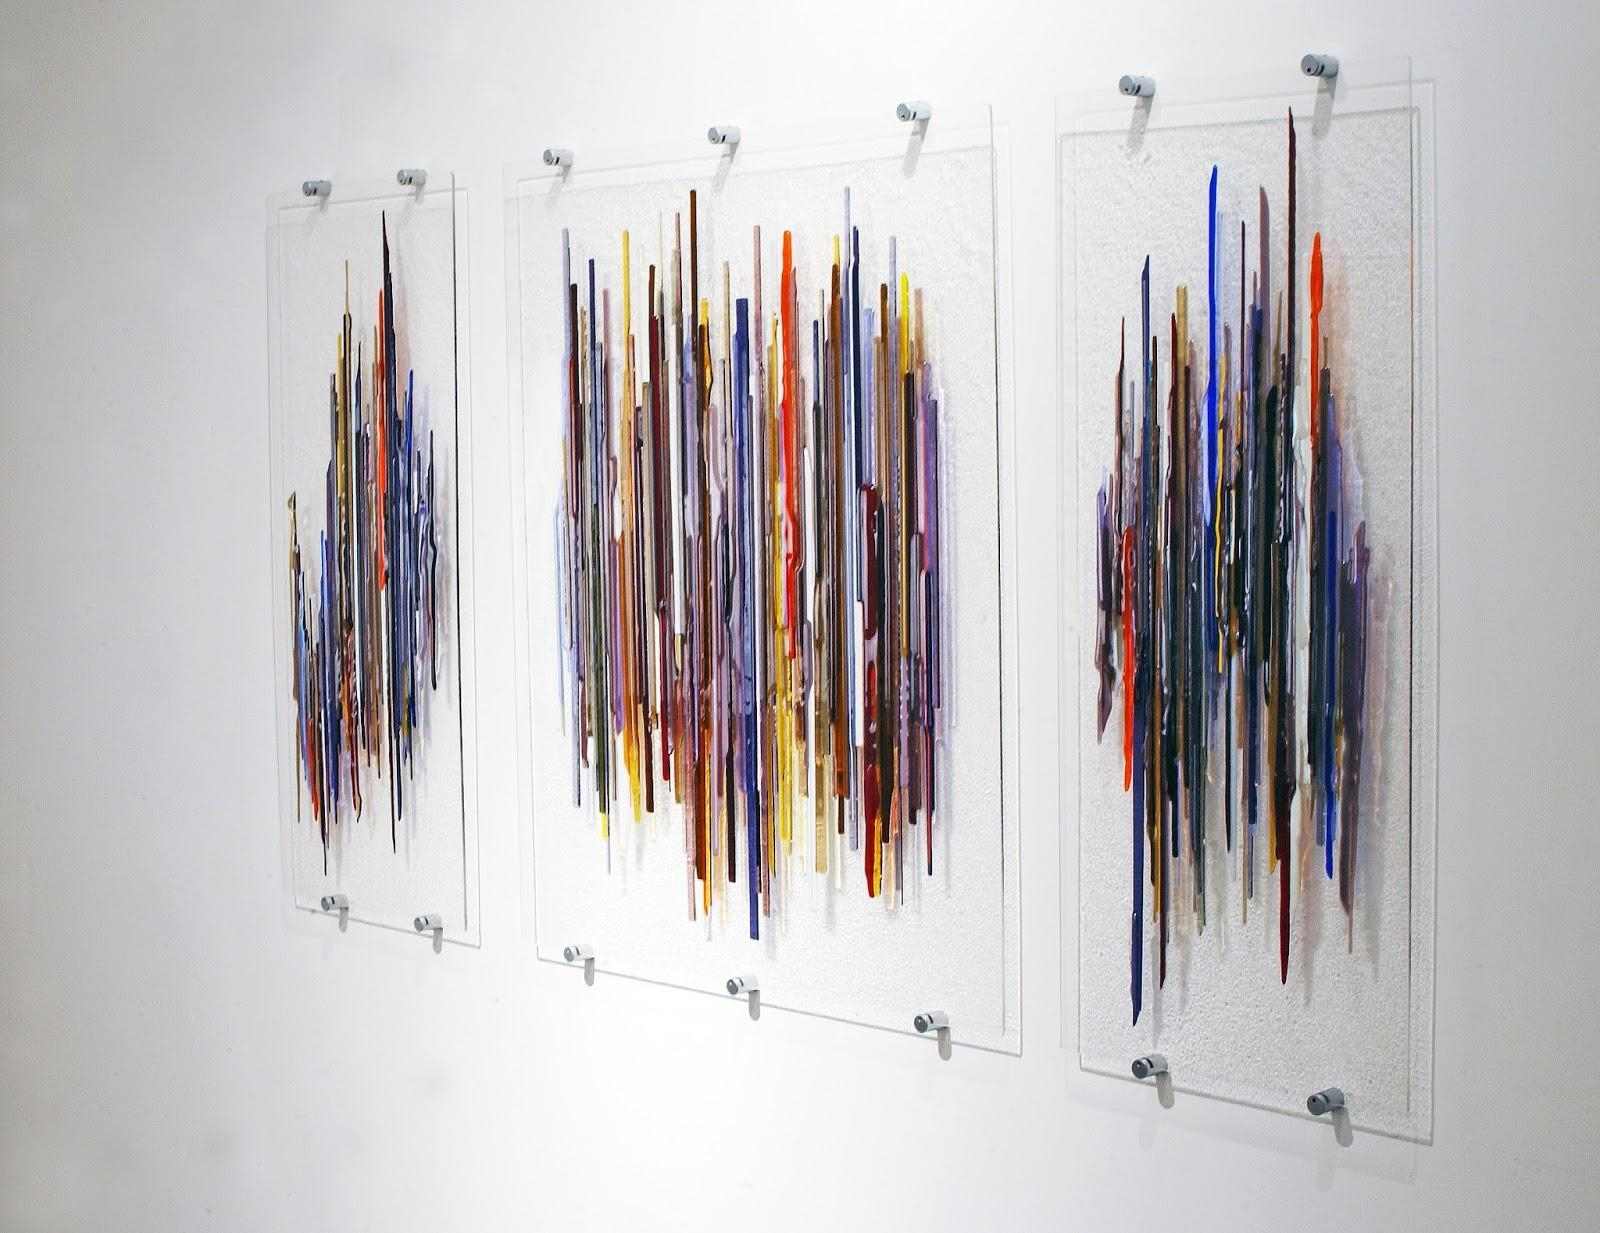 Wall Art Ideas Design : Fabrication Crafties Glass Wall Art Panels Inside Corporate Wall Art (Image 20 of 20)